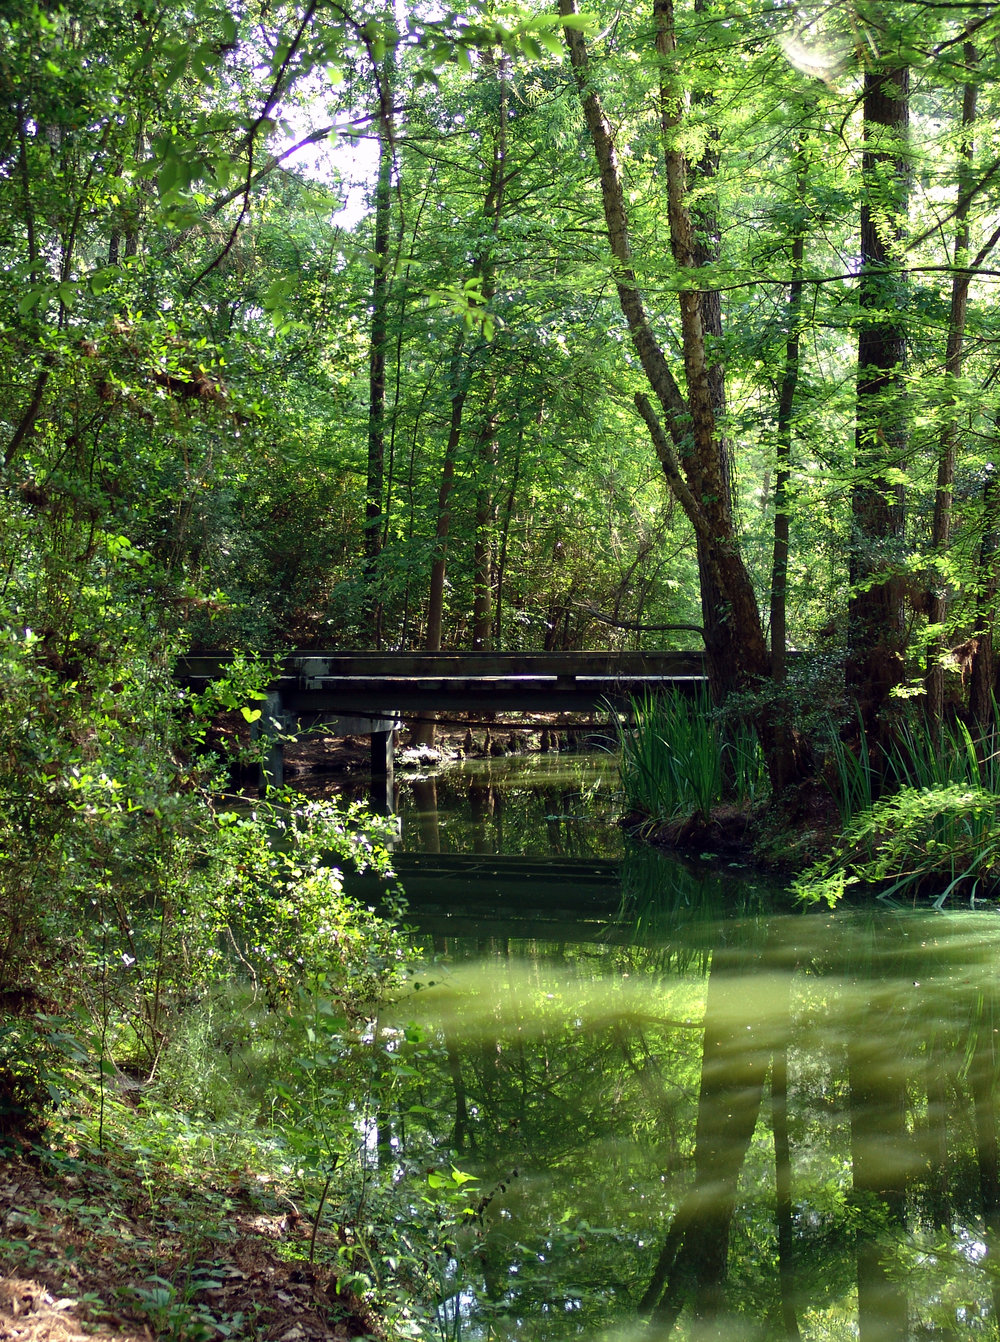 Forest_Bridge_in_The_Woodlands.jpg